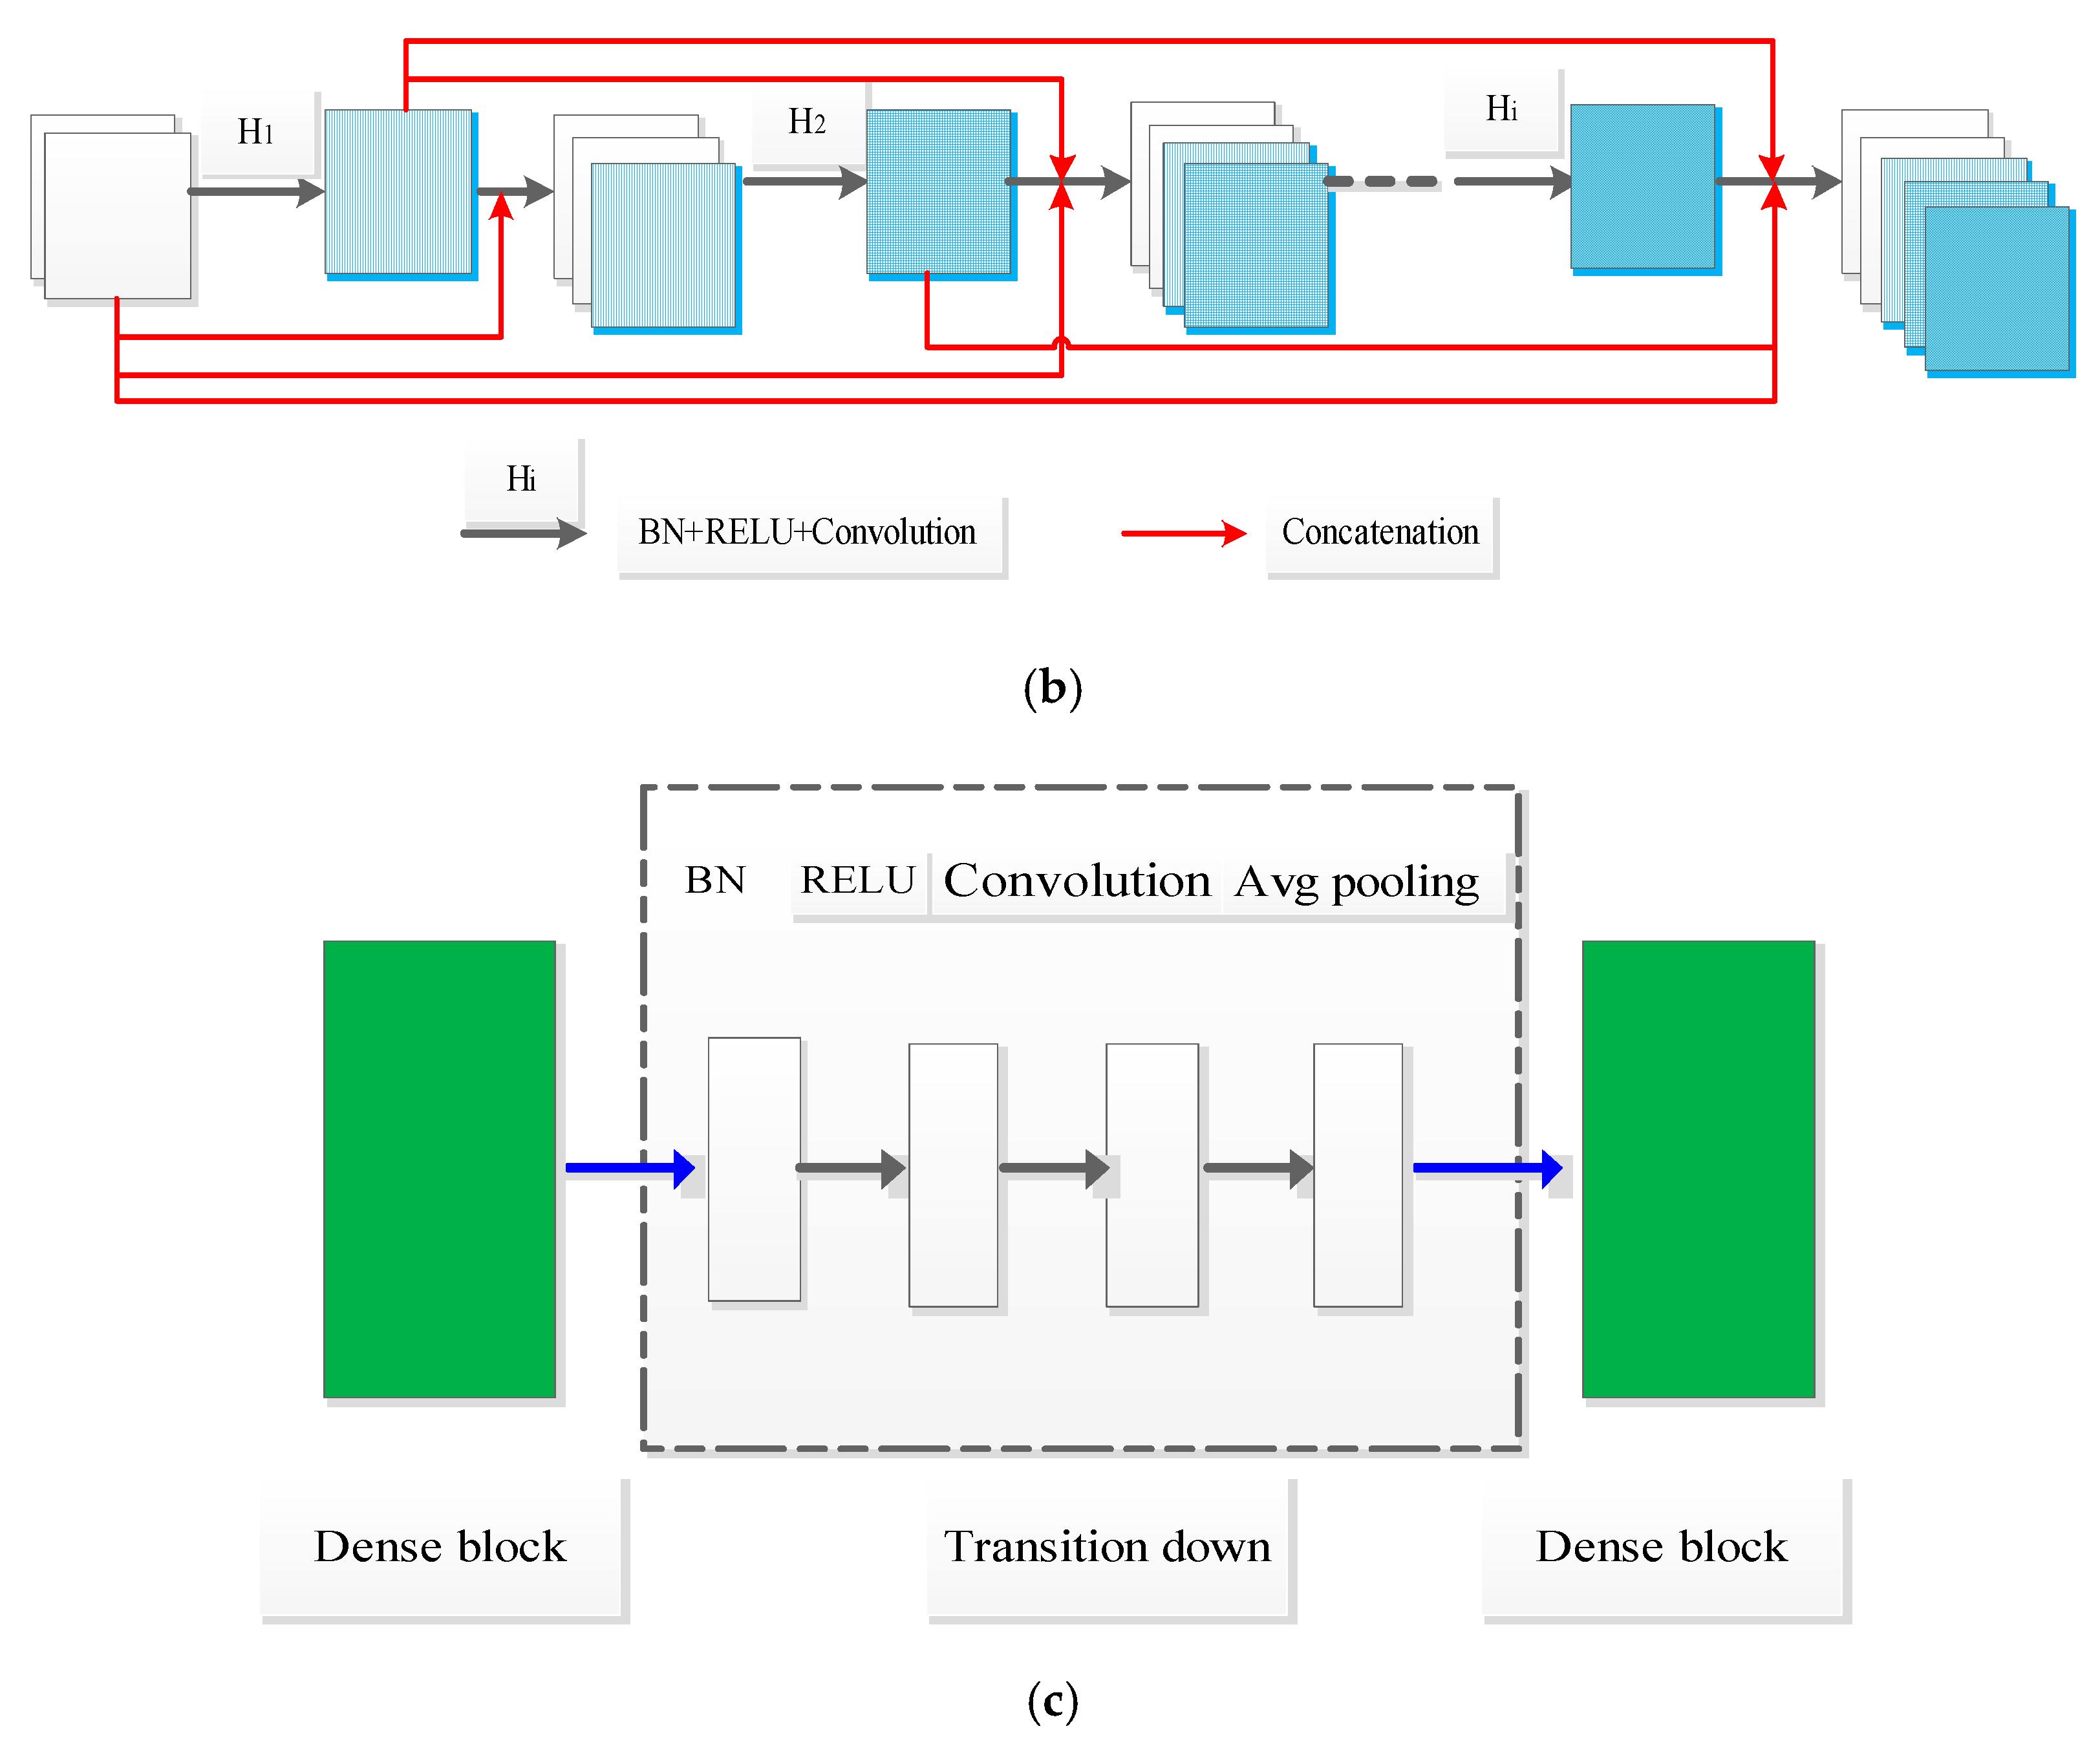 Entropy | Free Full-Text | Dense U-net Based on Patch-Based